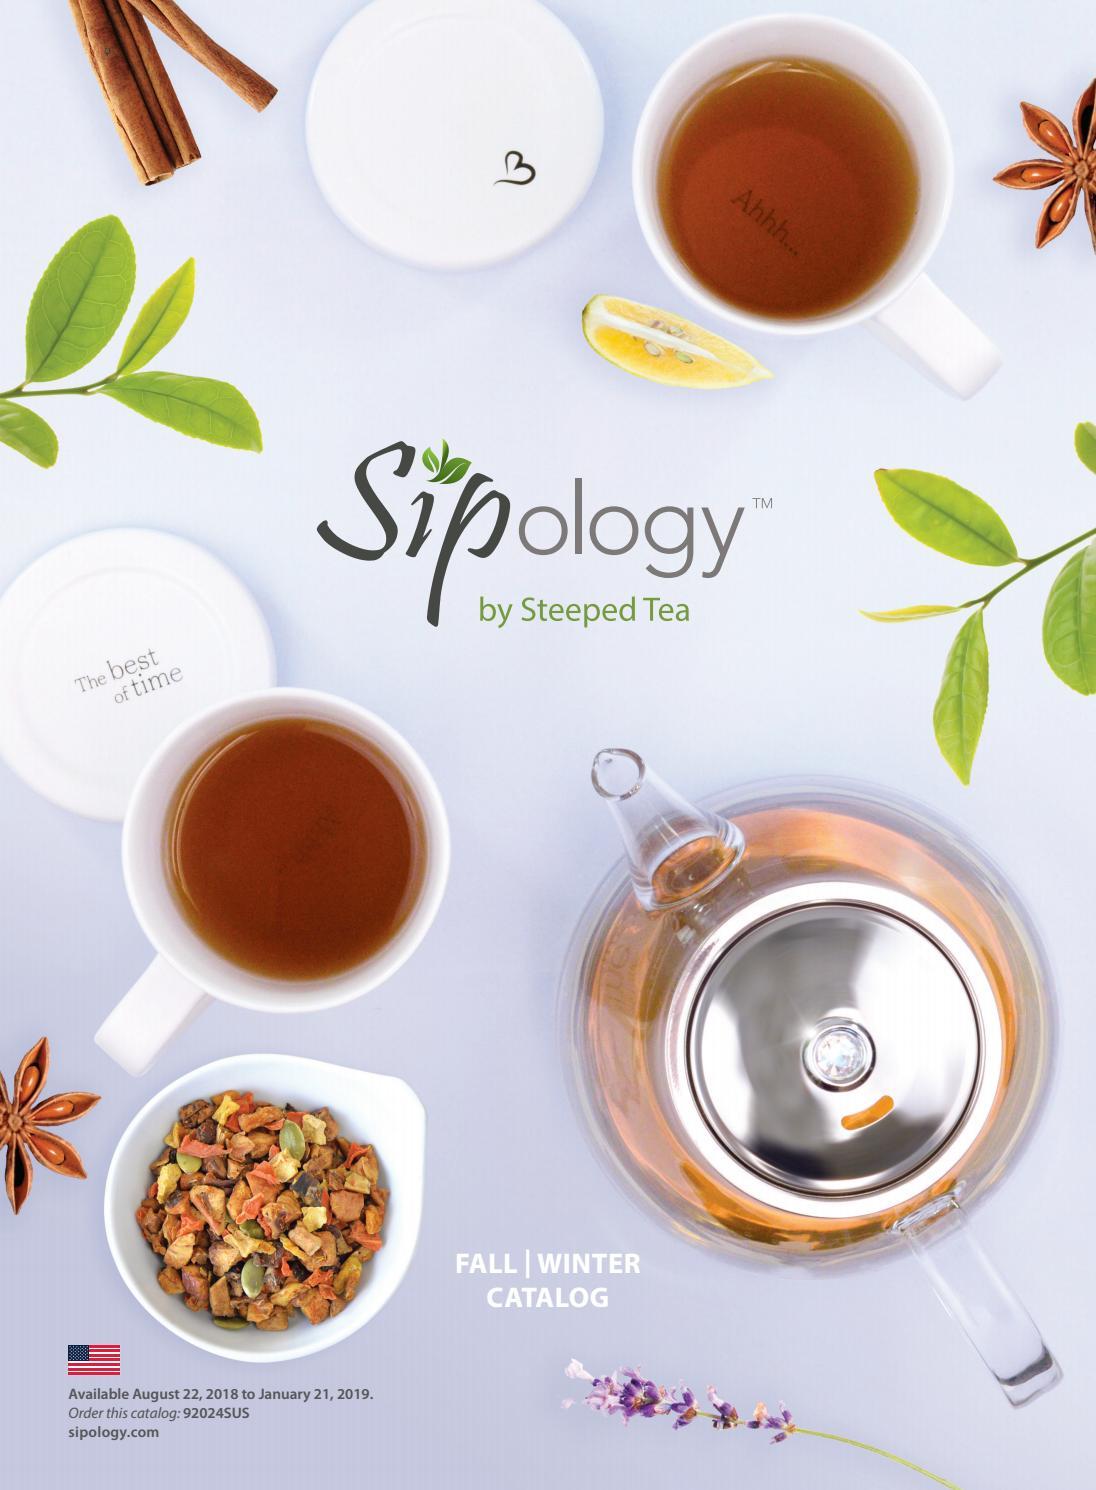 Simple Loose Leaf 4 oz USA Hand Packaged Orange Blossom Oolong Tea Premium Loose Leaf Oolong Tea Classic and Mild 60 Cups - High Caffeine